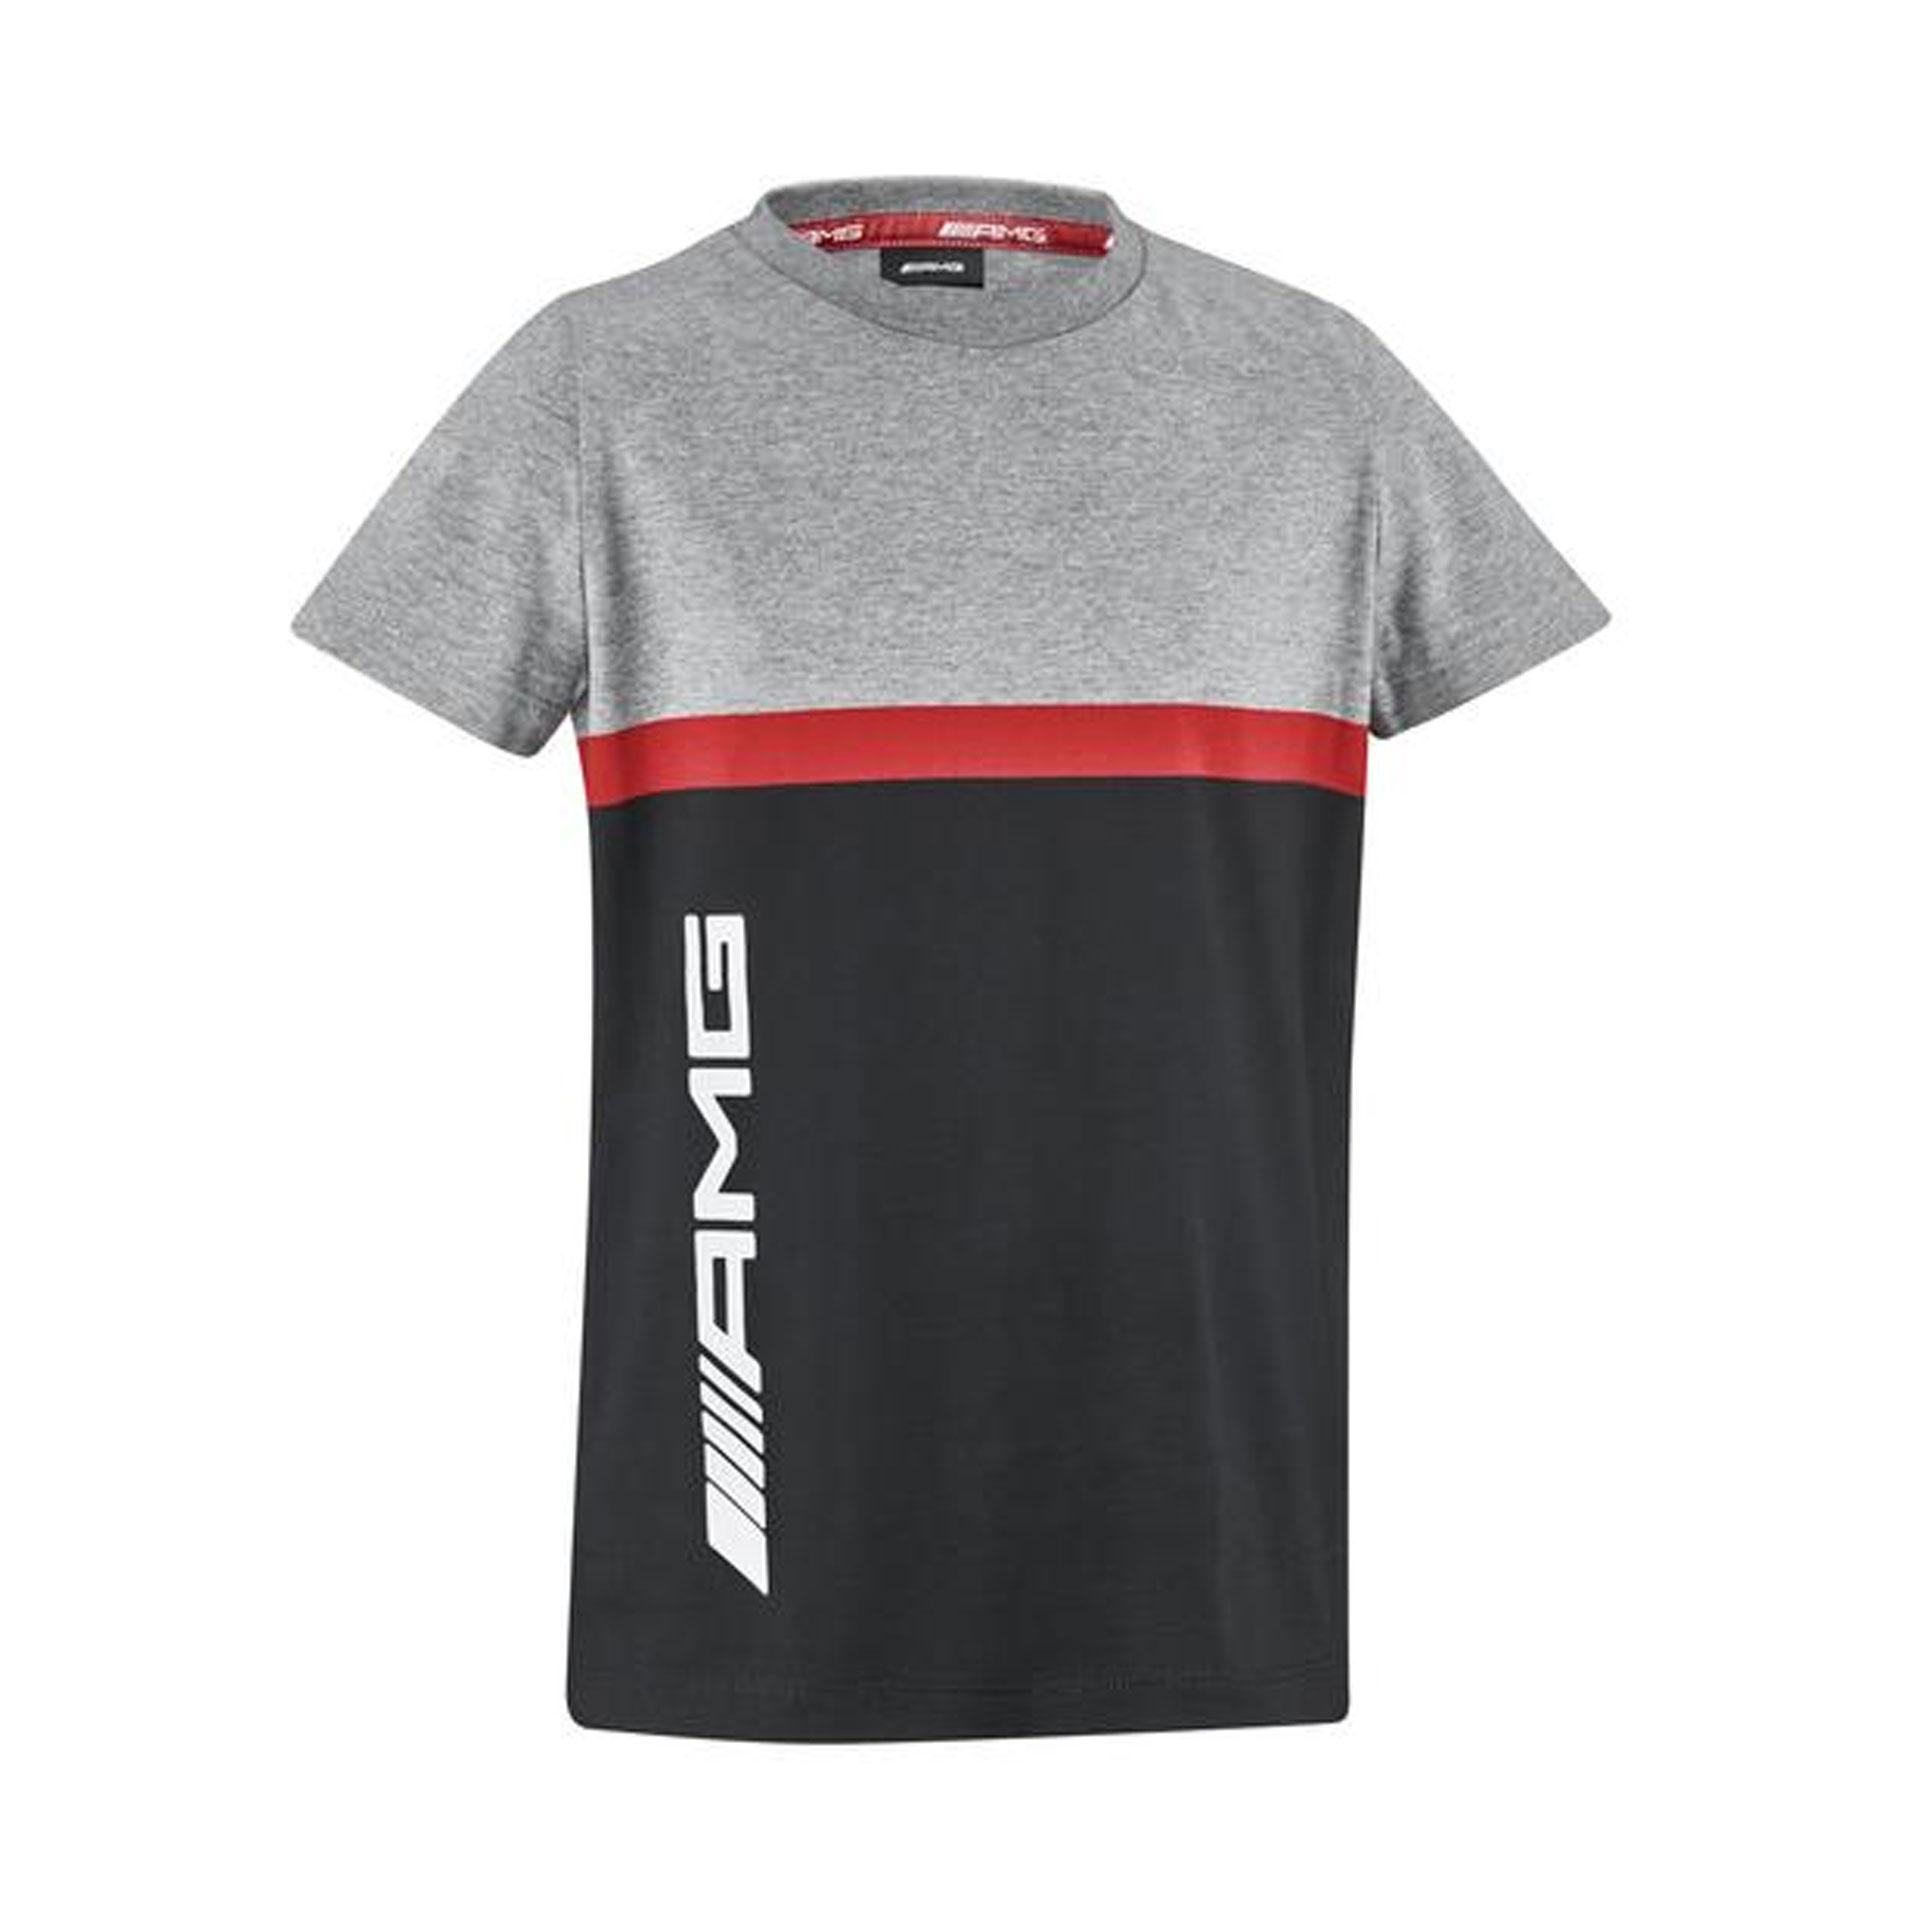 Mercedes-AMG T-Shirt Kinder grau schwarz rot